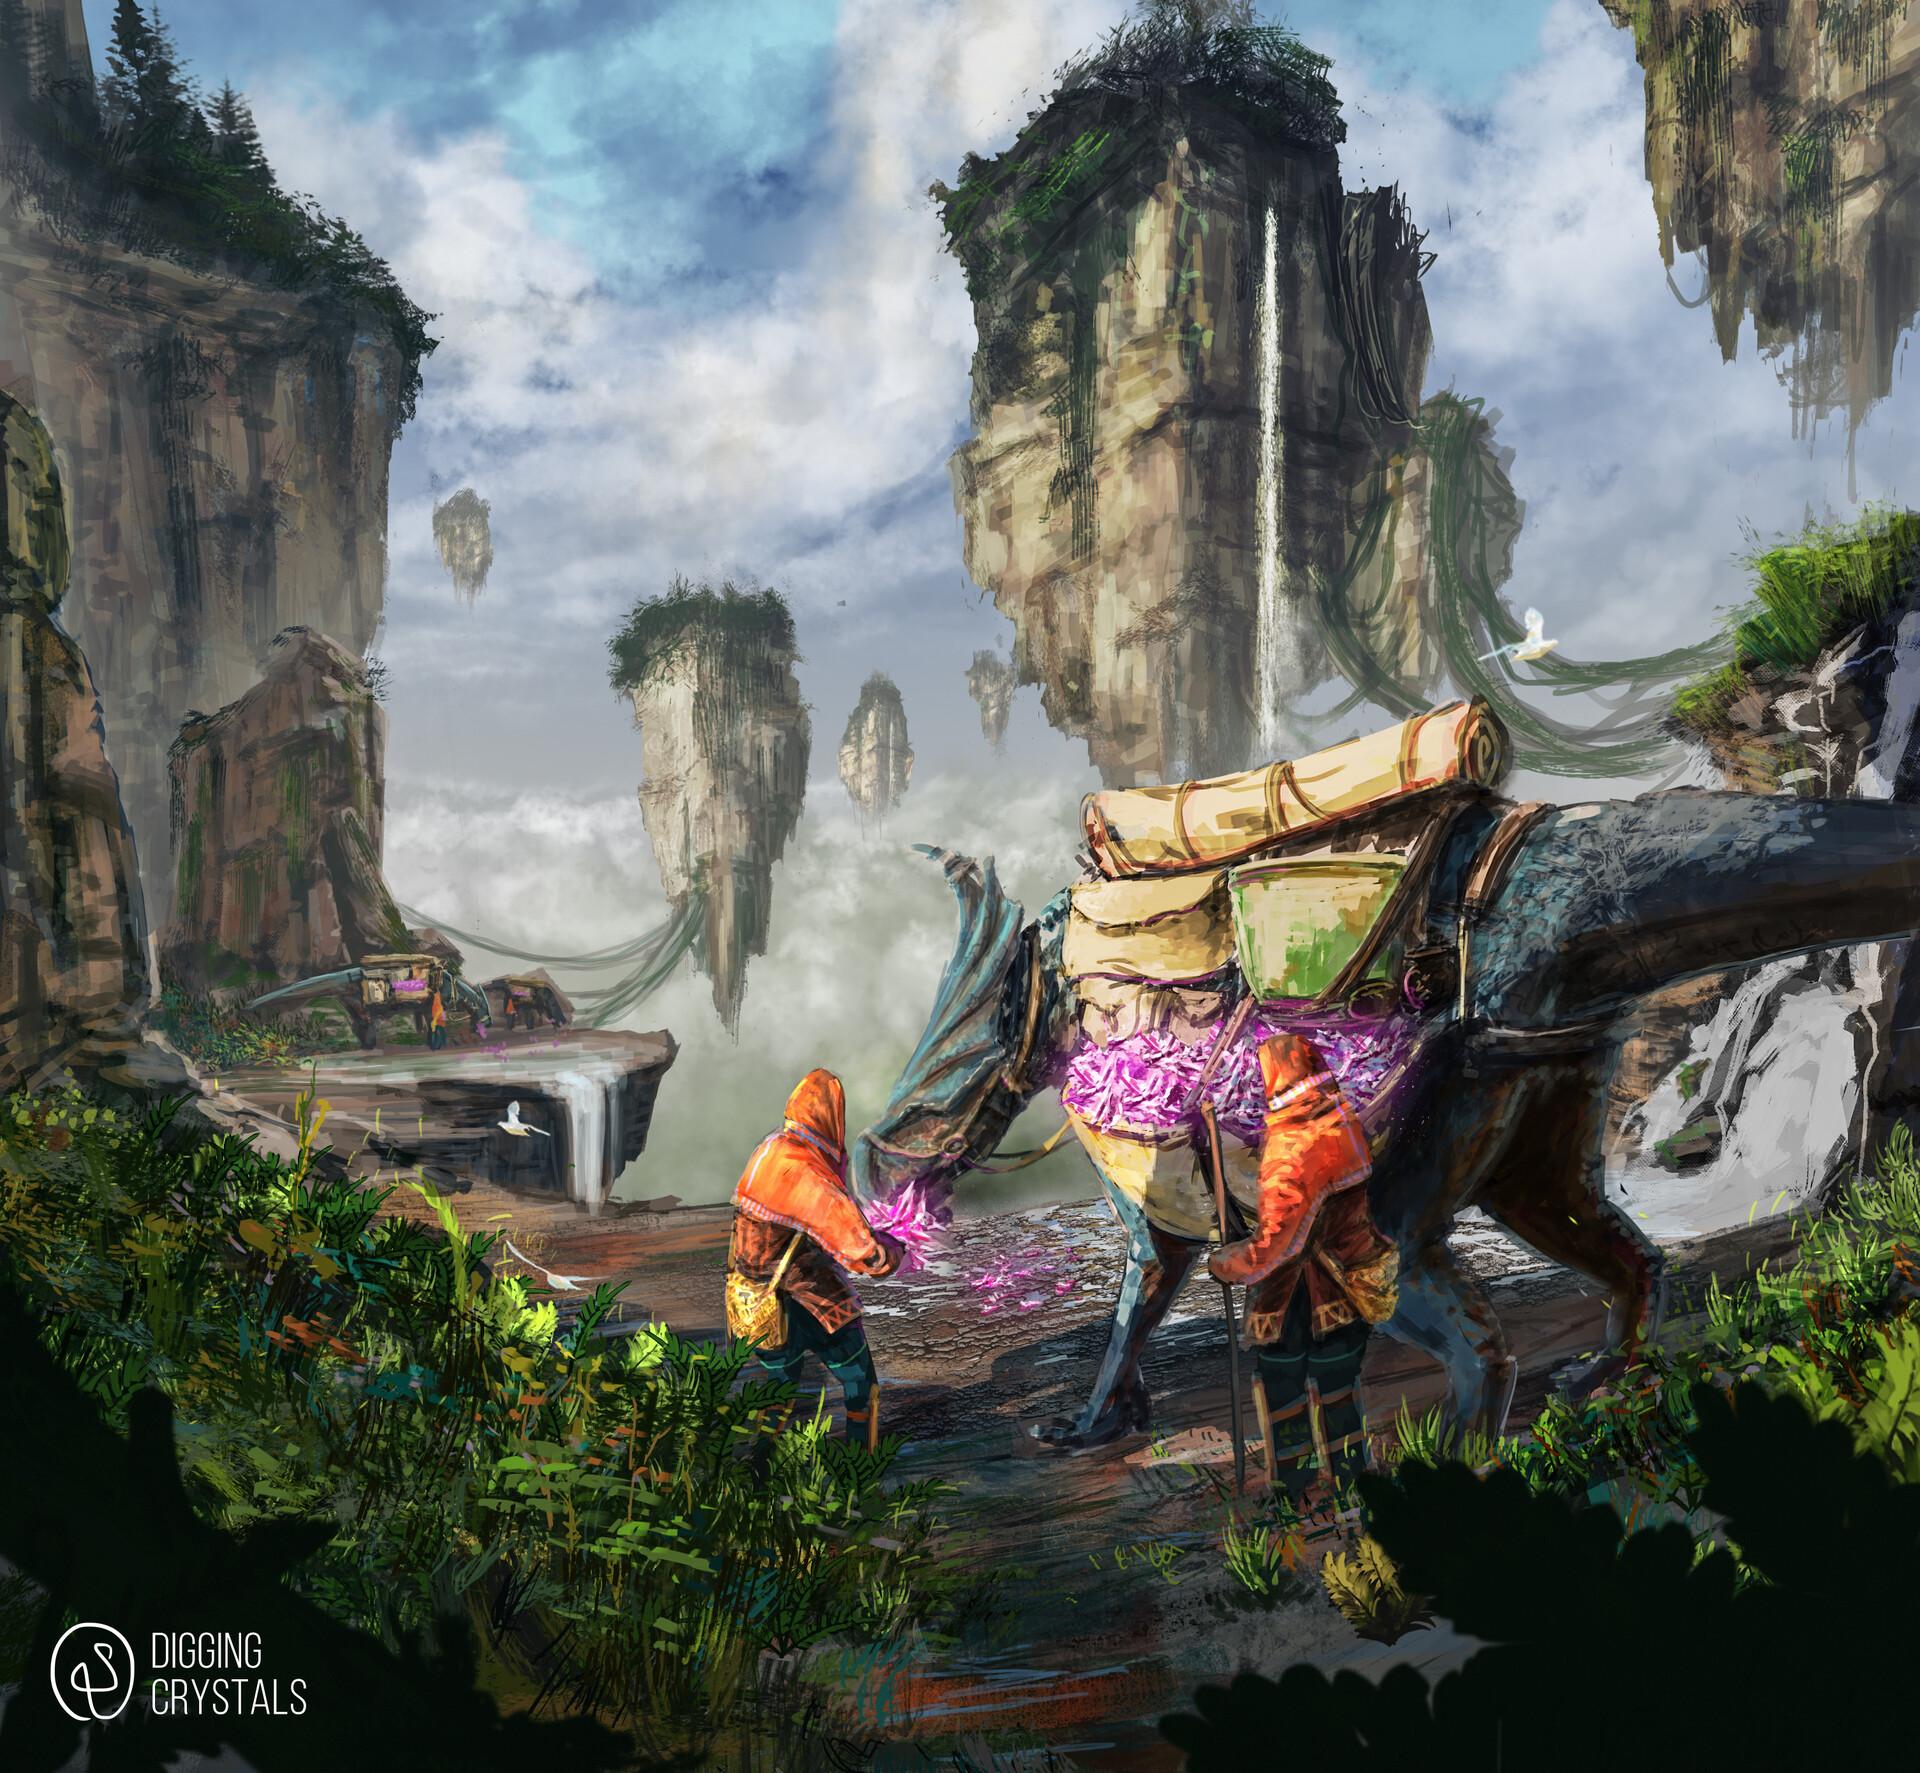 ArtStation - Digging Crystals, Rai Serrano